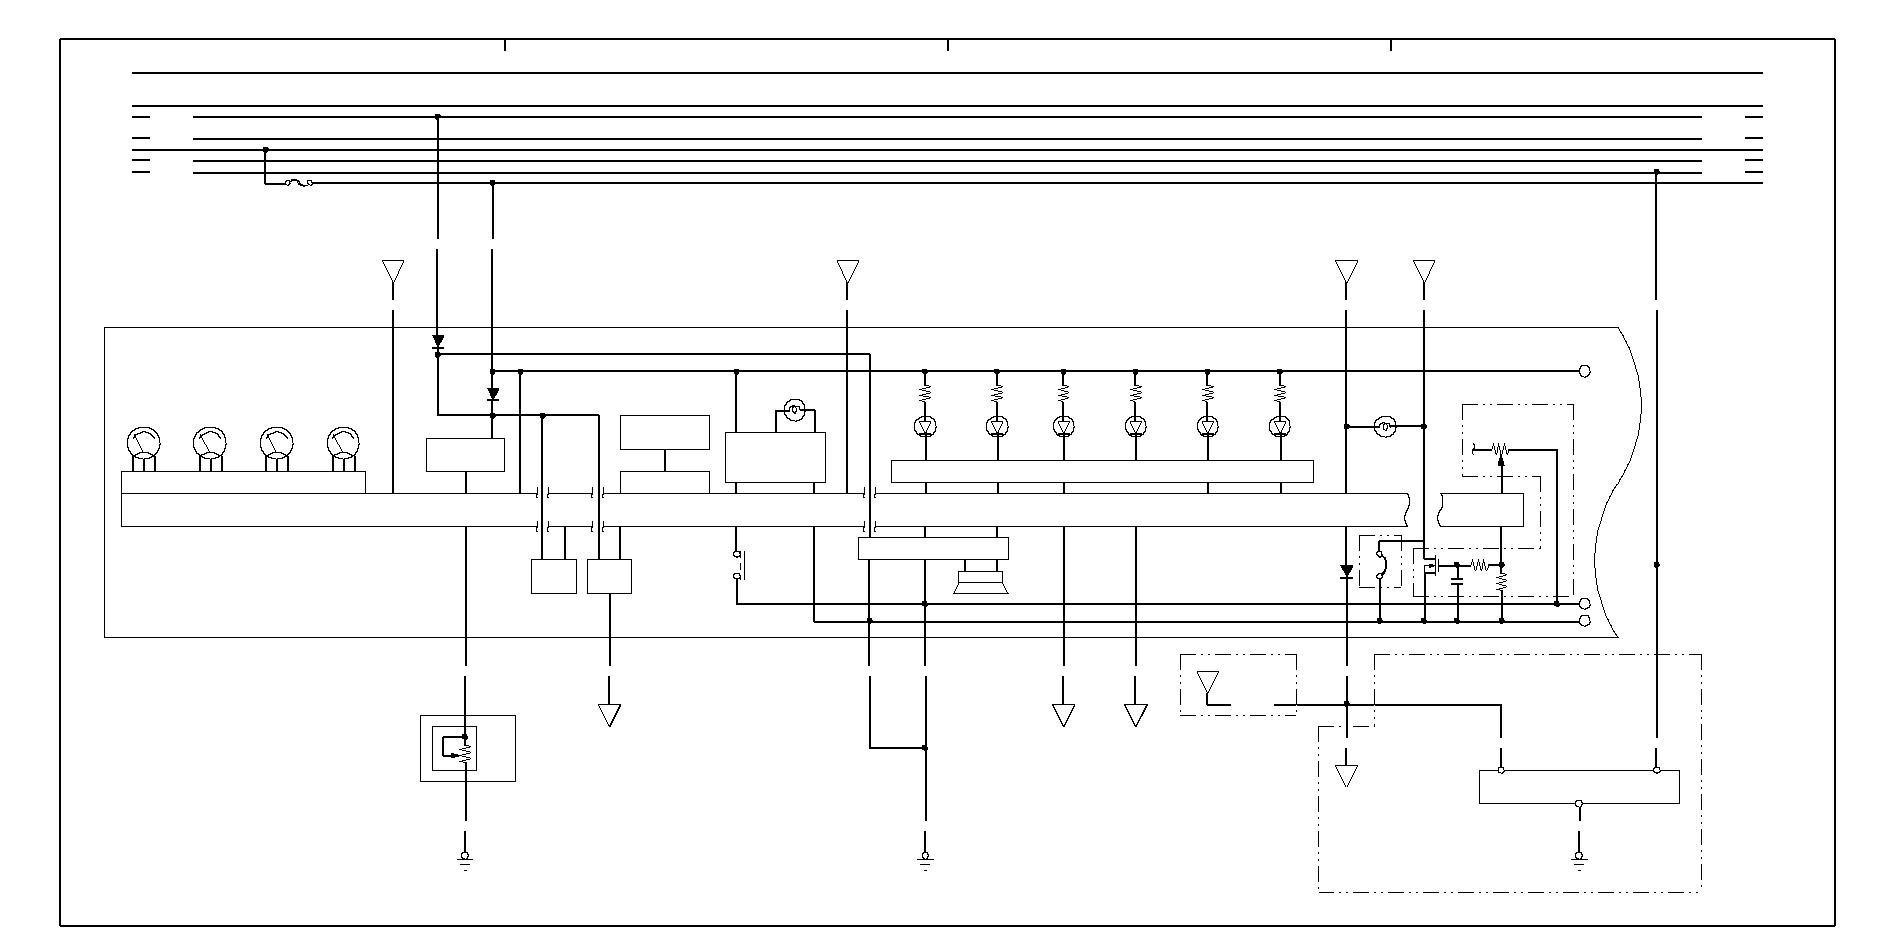 2005 Honda Cr V Wiring Diagram Wiring Diagram Write Expedition Write Expedition Lasuiteclub It